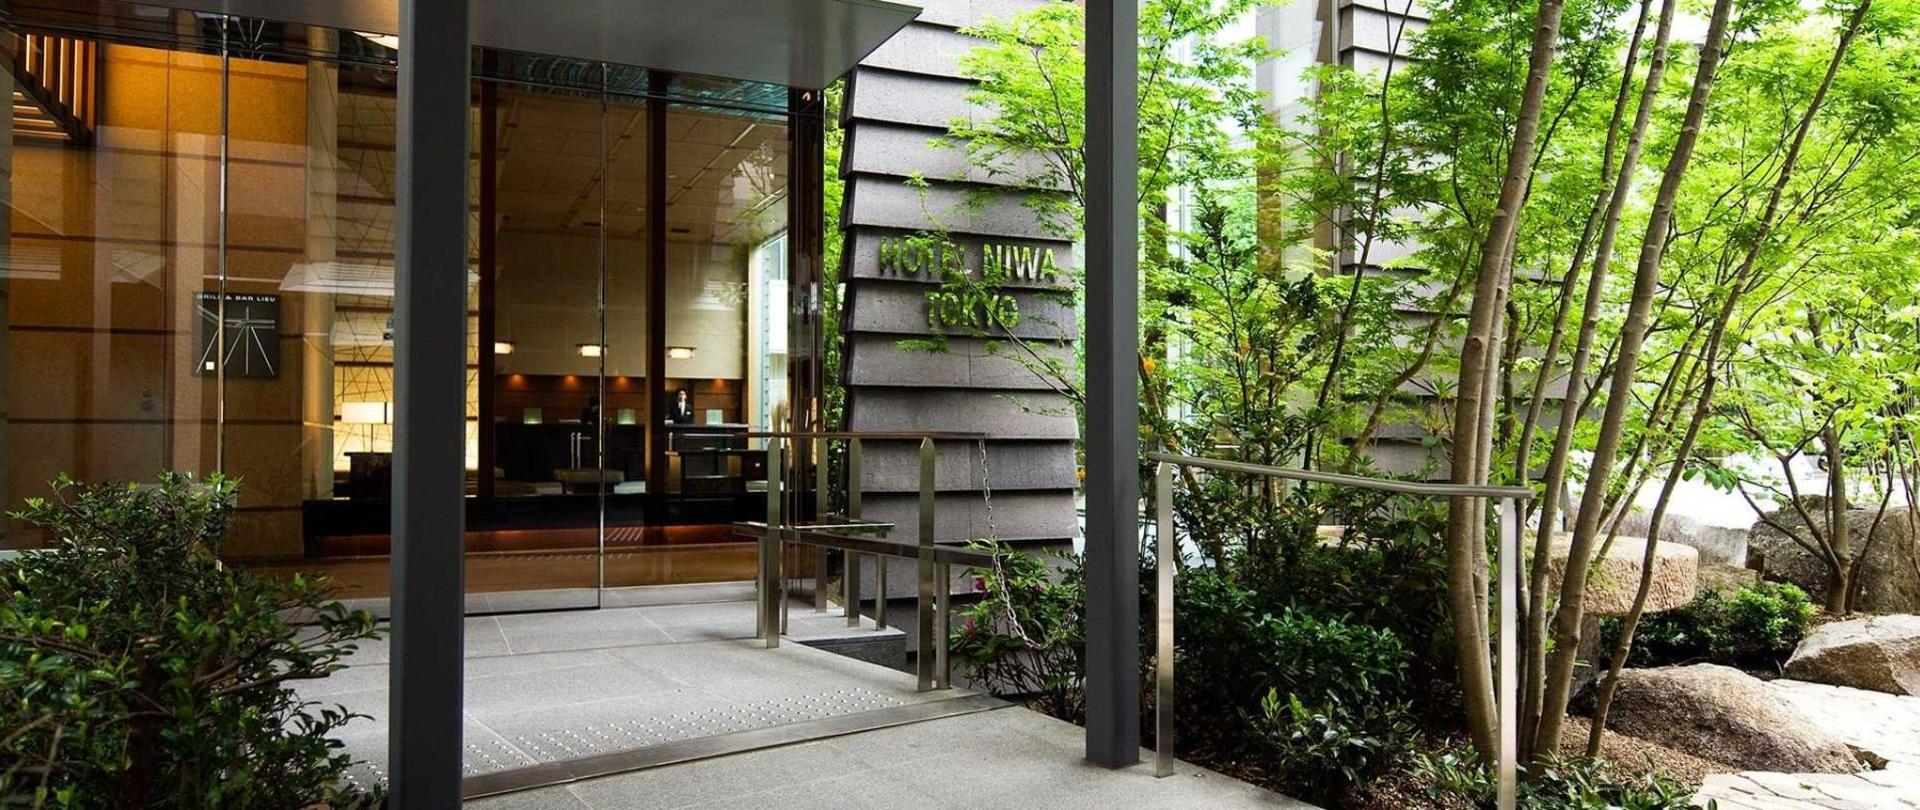 Hotel Niwa Tokyo酒店